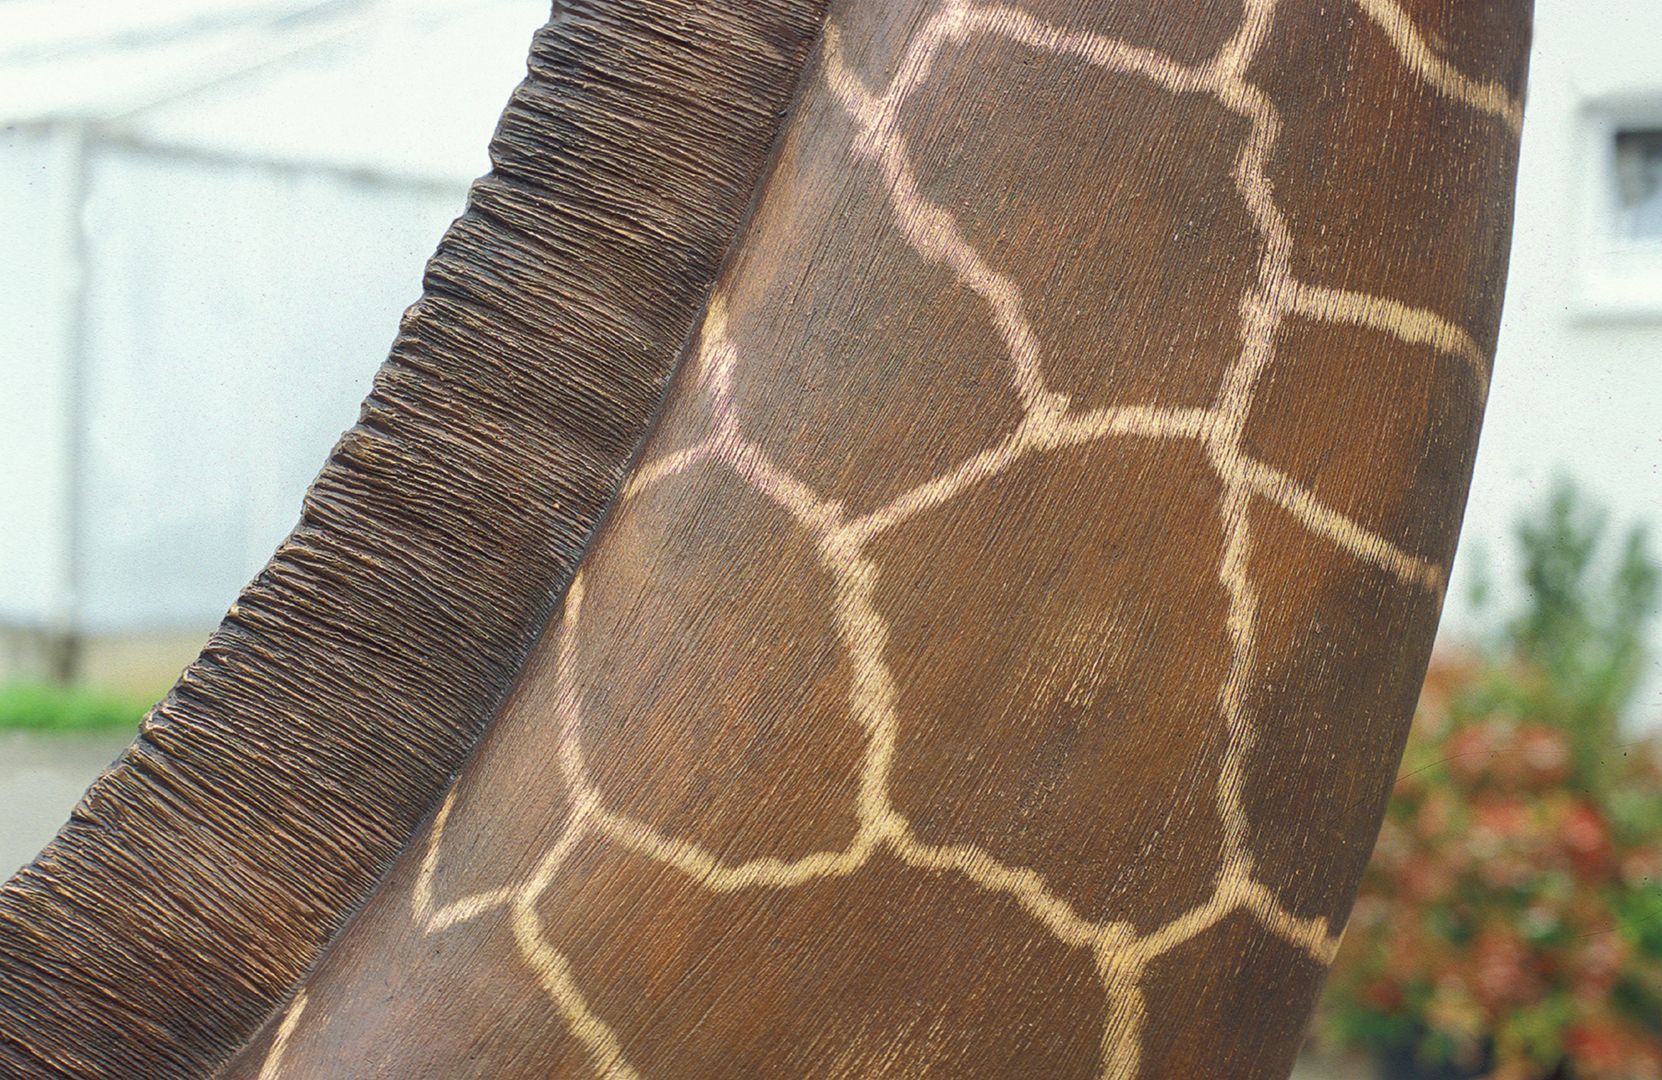 Reticulated giraffe Neck, detail